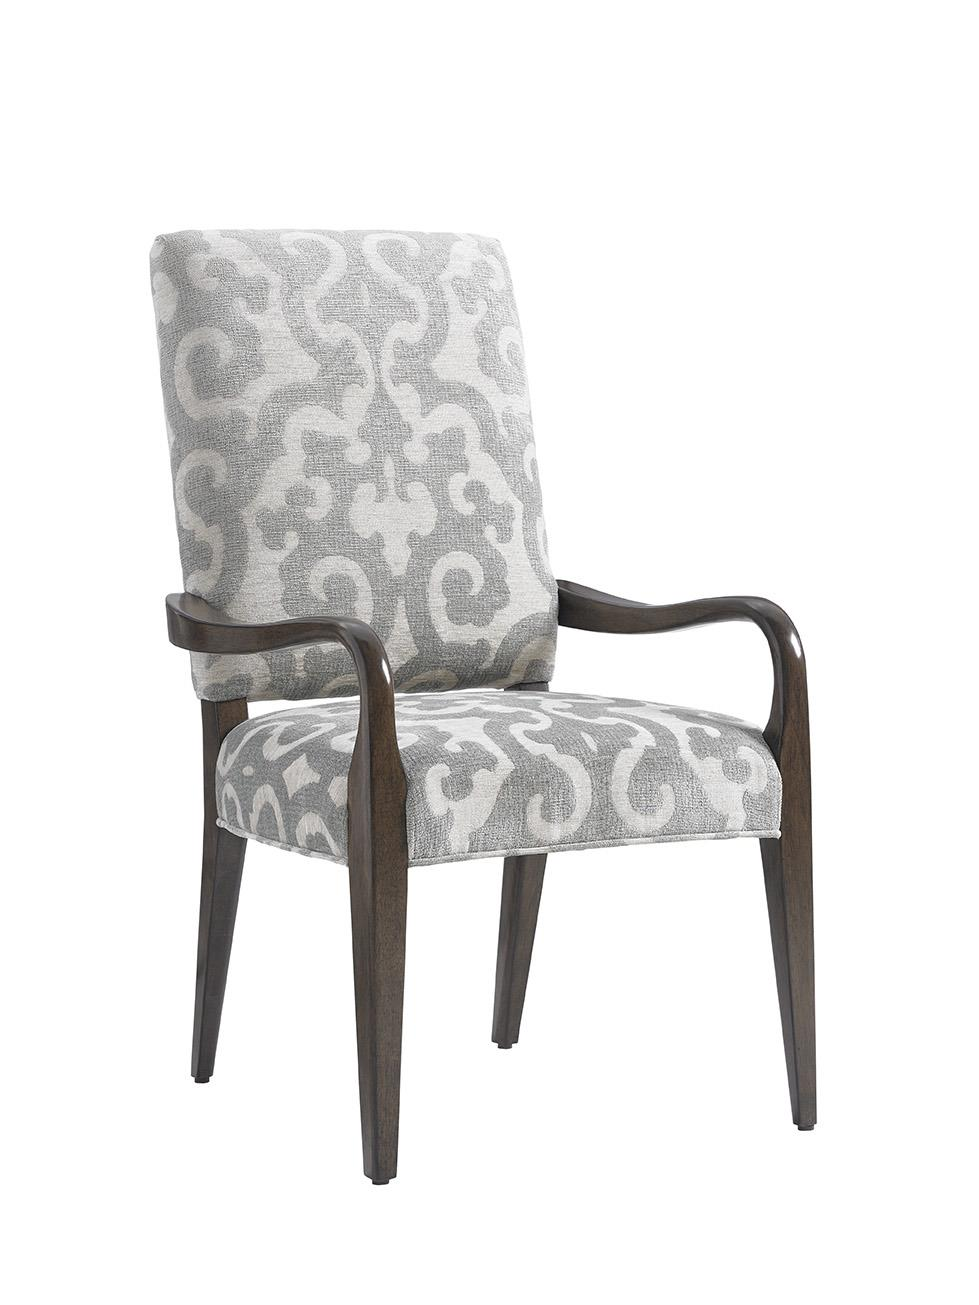 LAUREL CANYON Sierra Arm Chair (Custom) by Lexington at Johnny Janosik